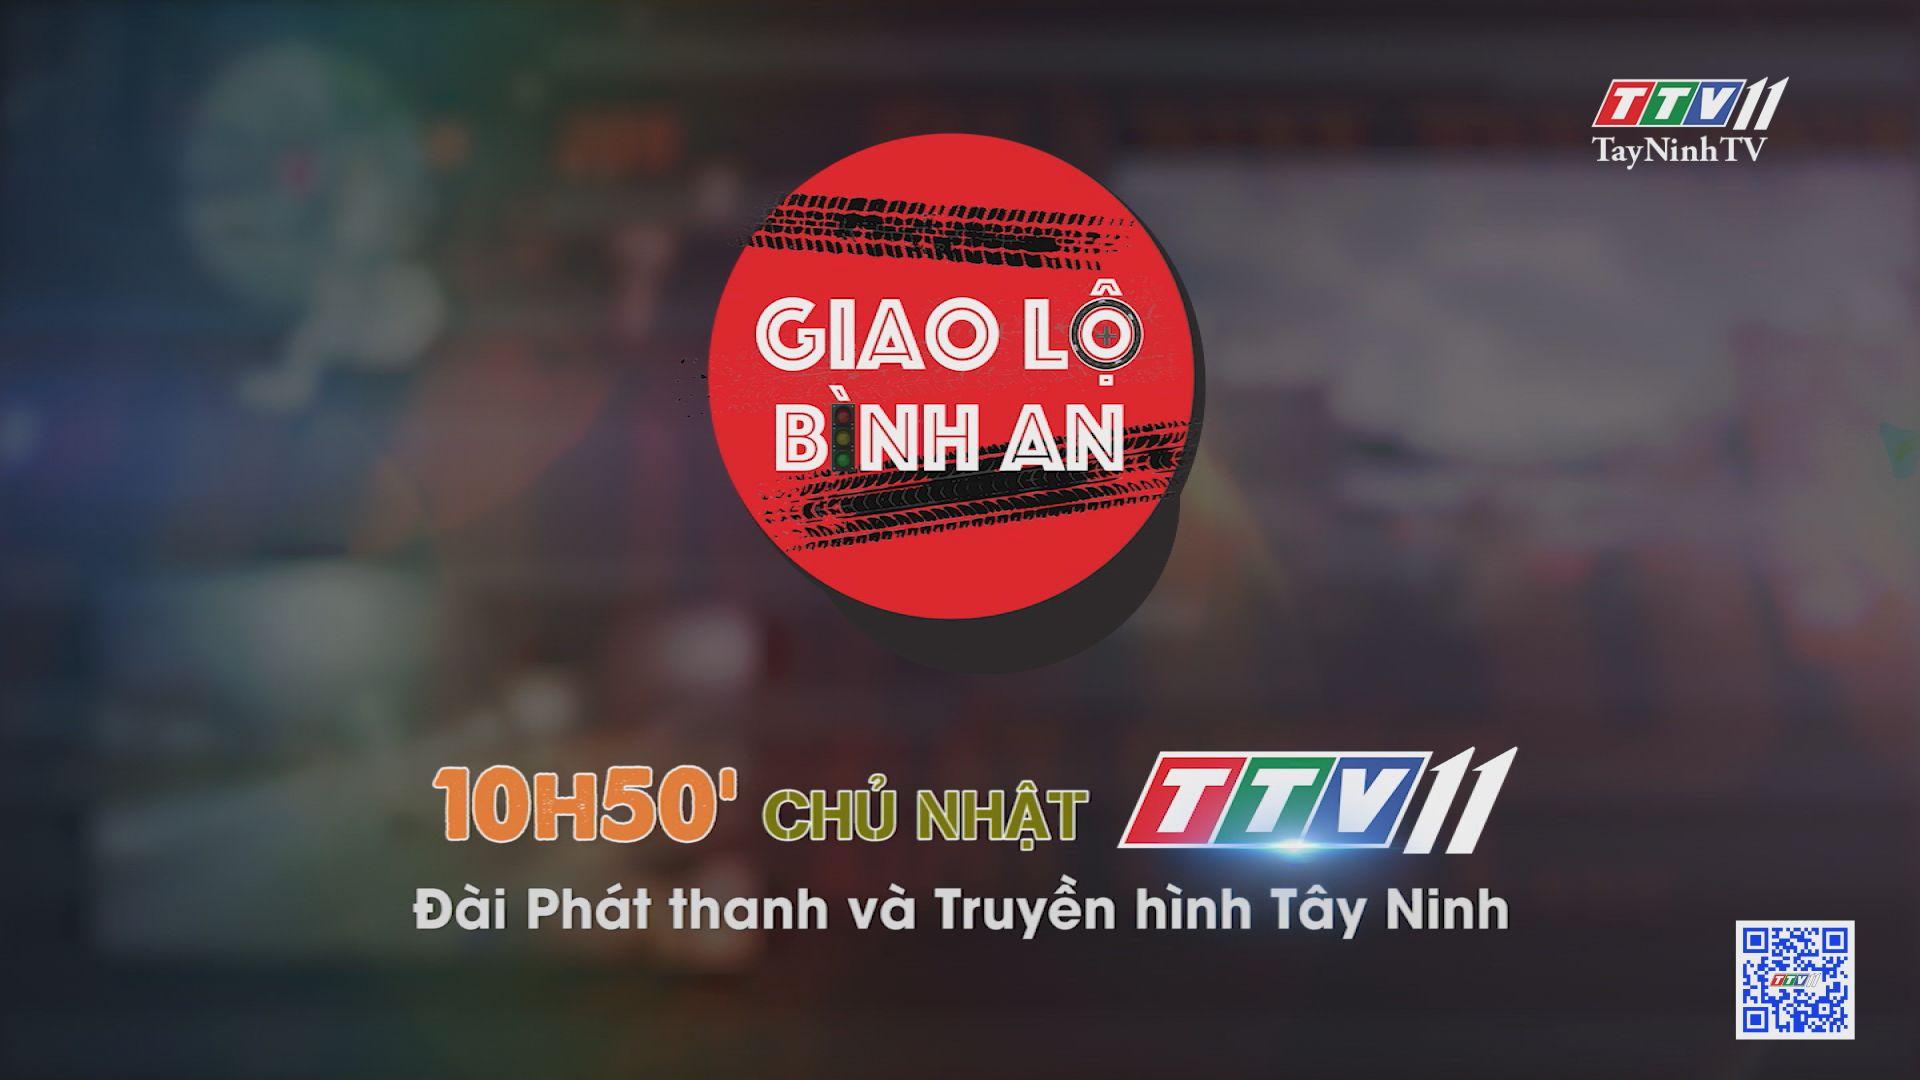 Giao lộ bình an-Trailer | TayNinhTVE